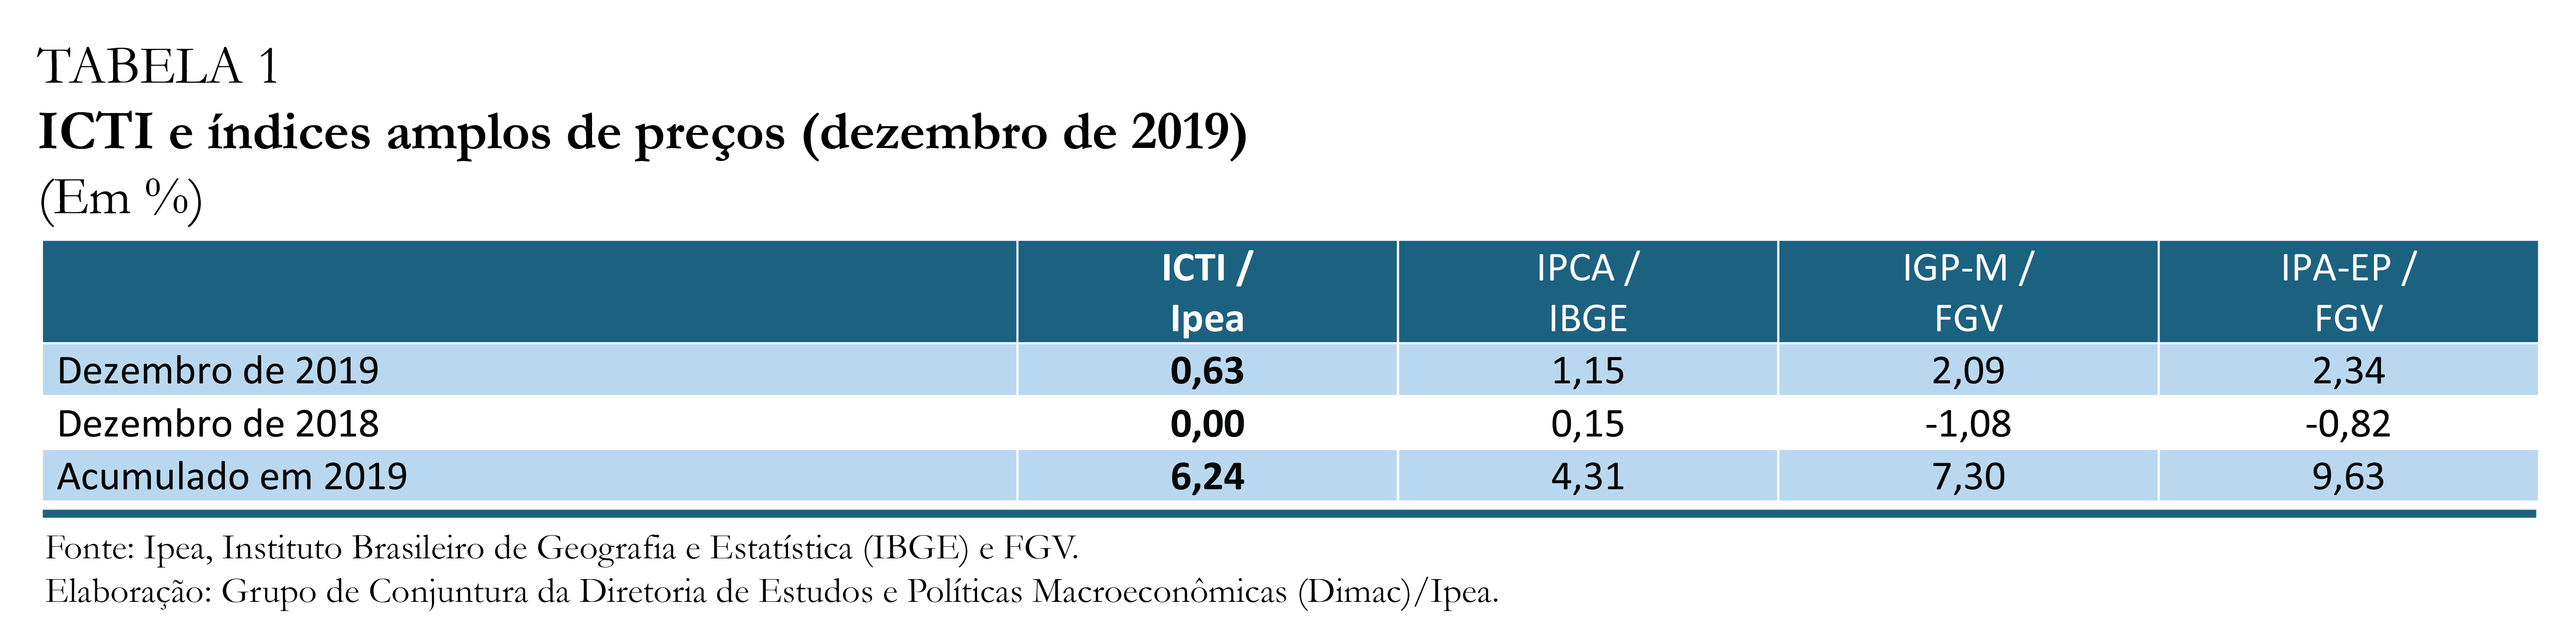 ICTI dez-19_tabela 1